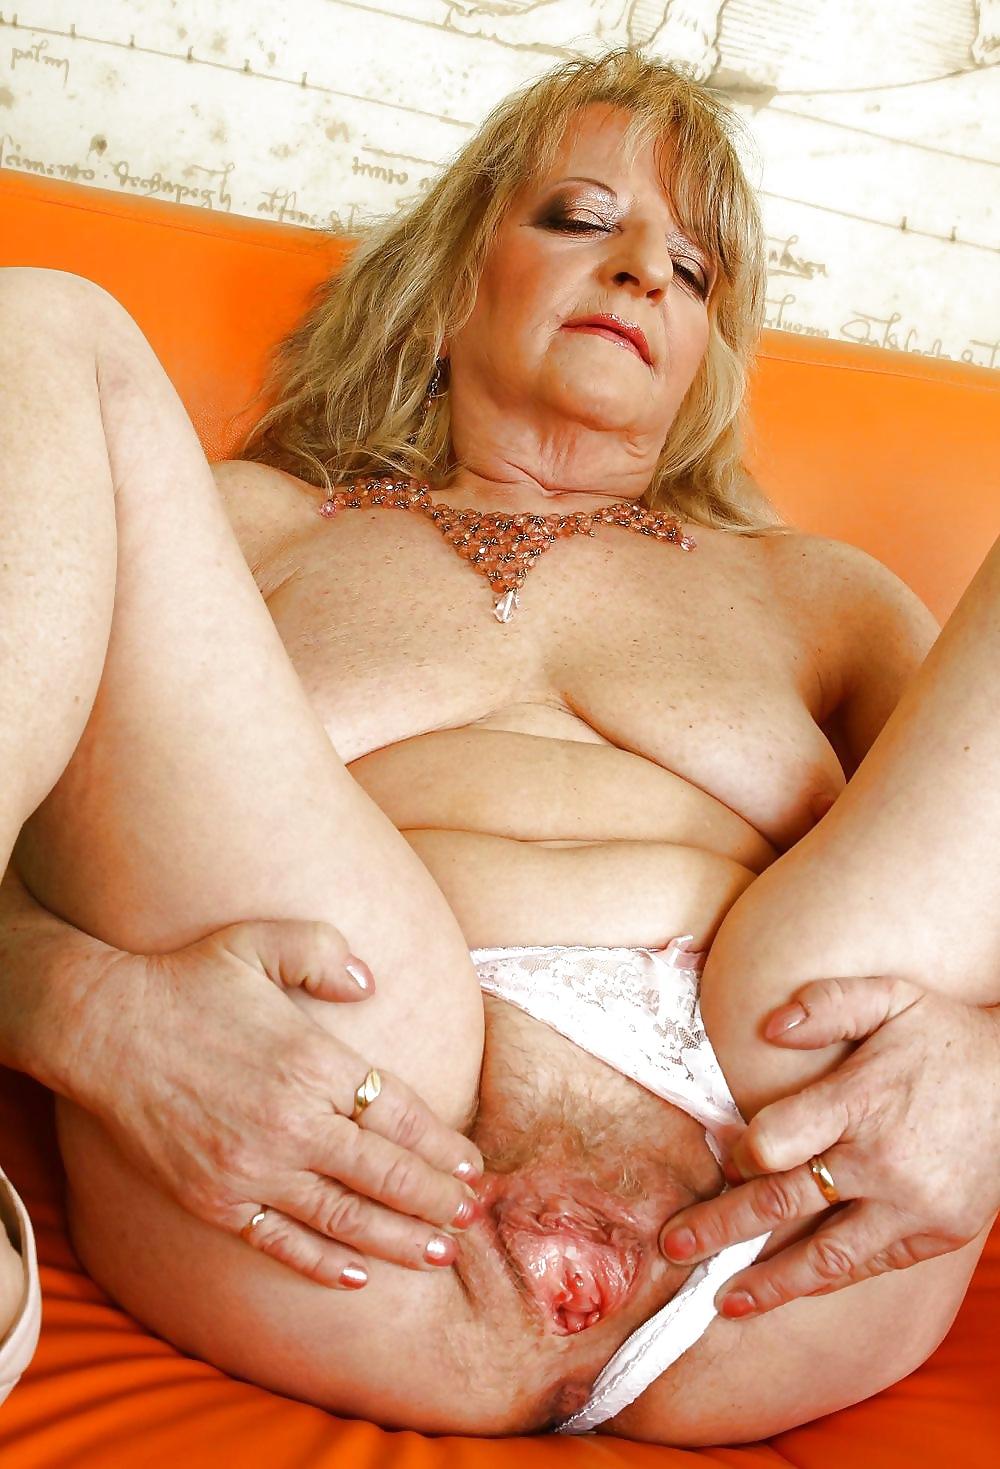 tasty playgirl shows hairy gash